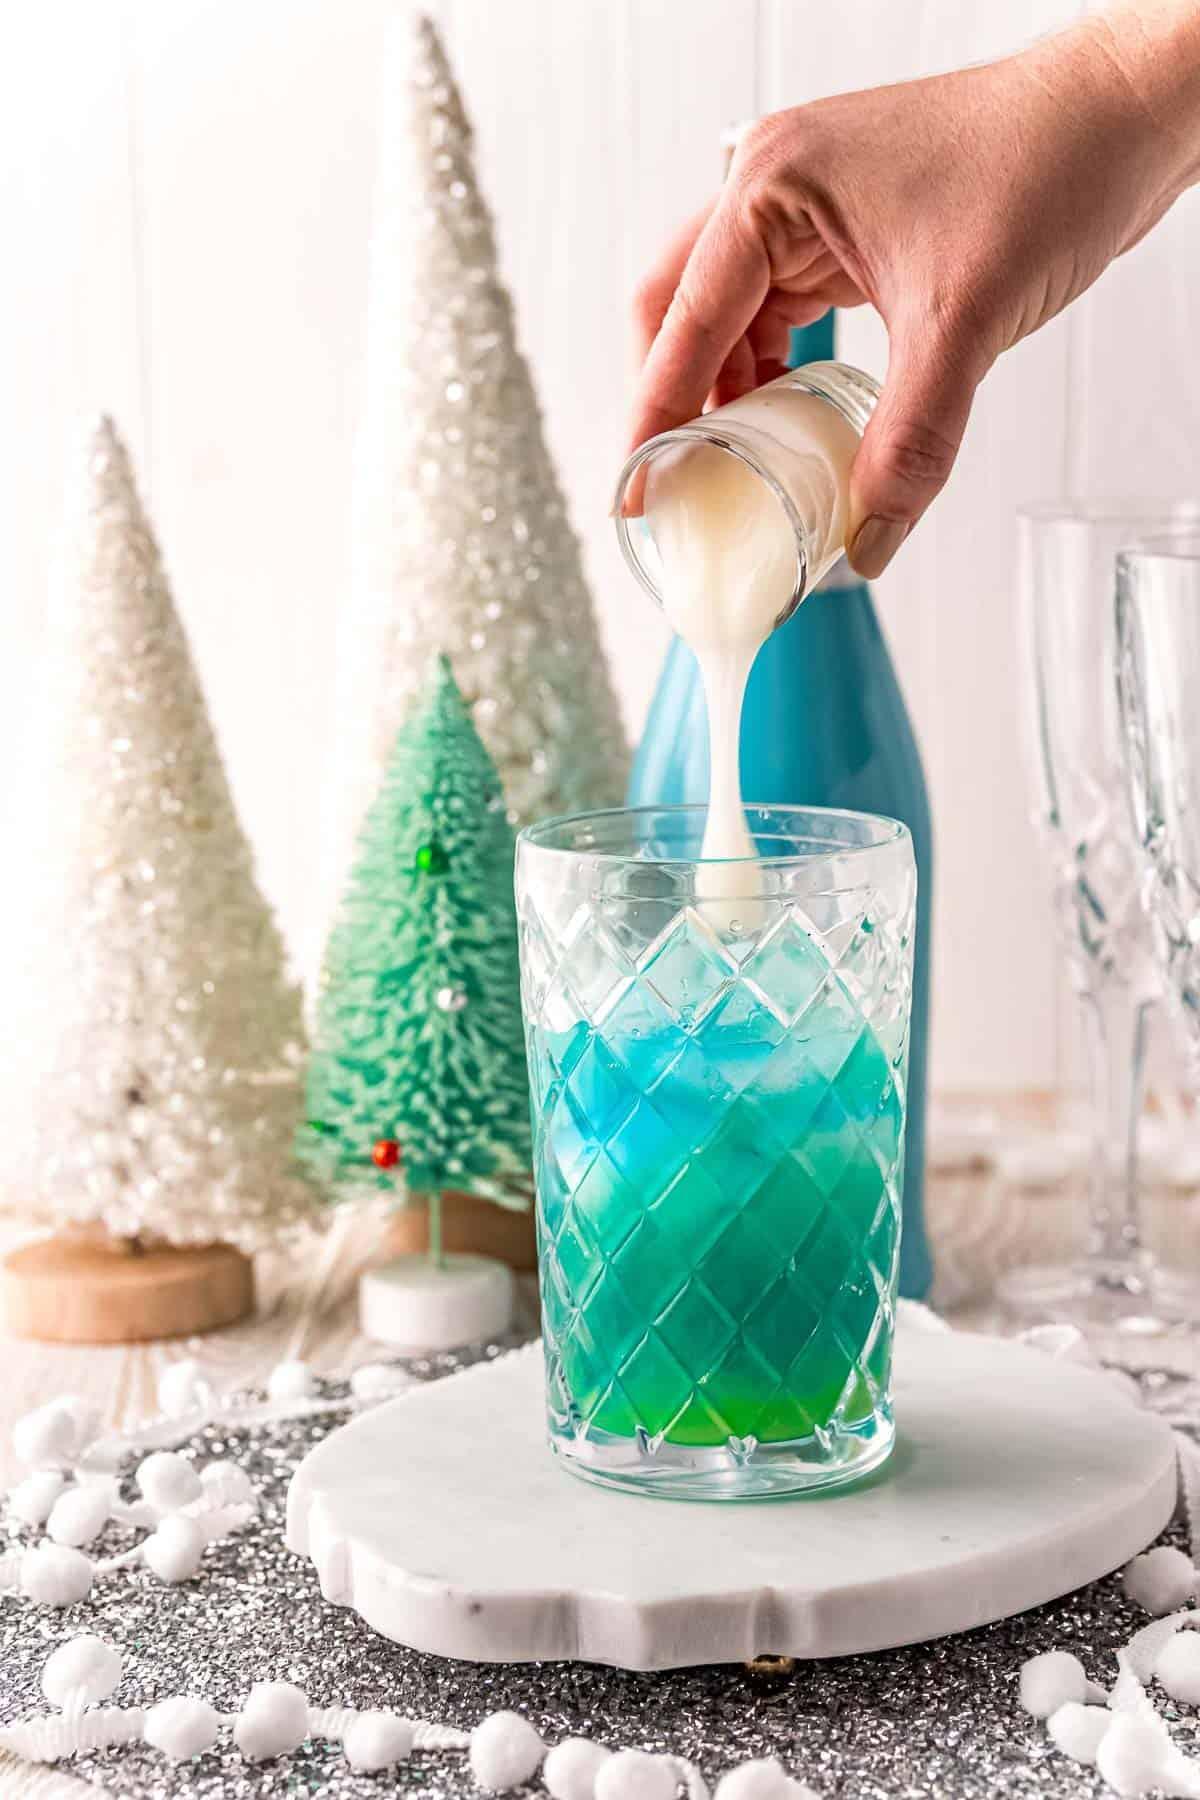 White liquid being poured into blue liquid.